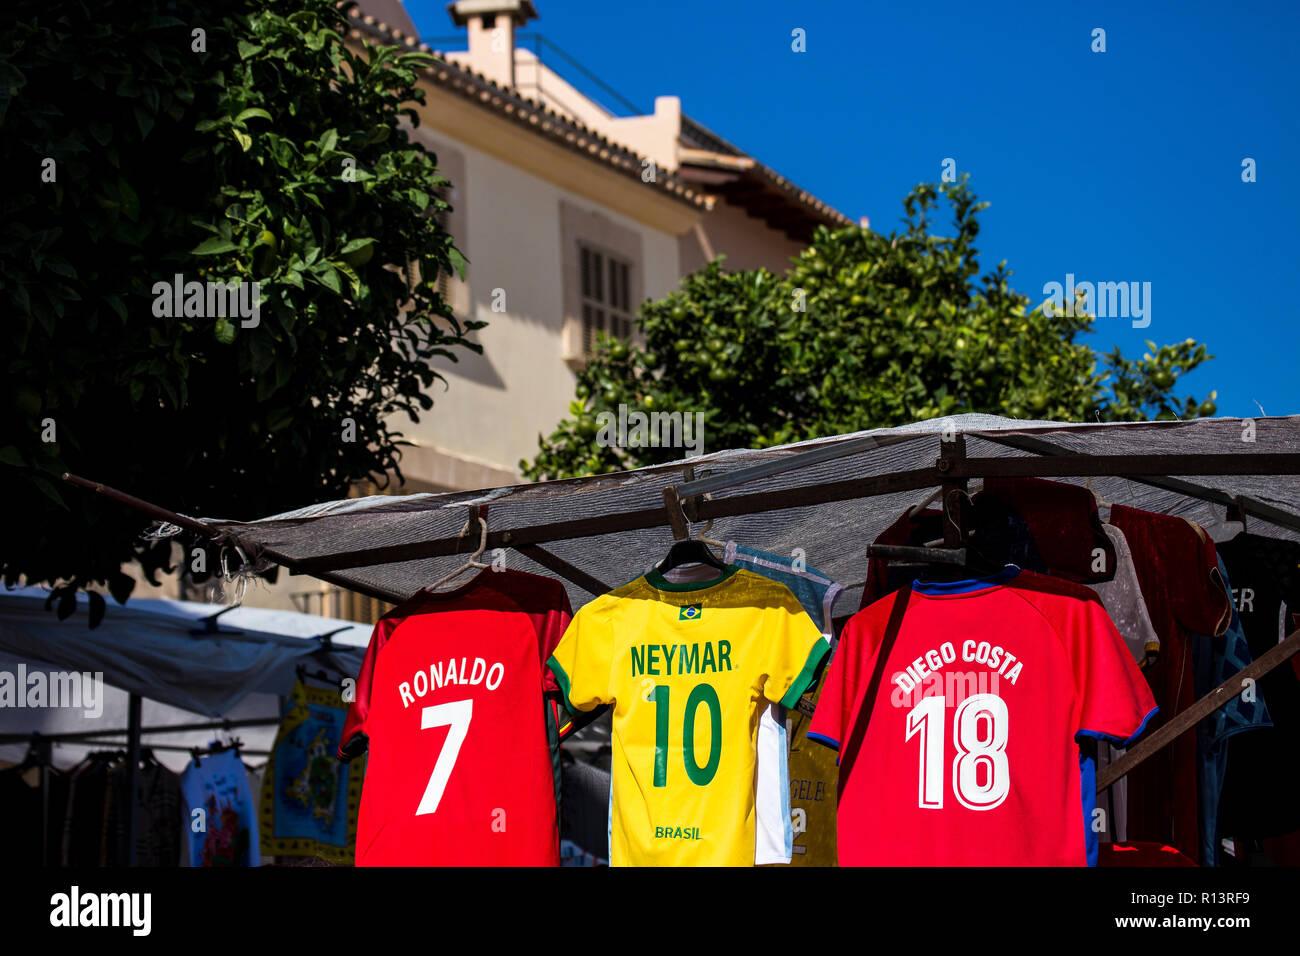 Camiseta De Fútbol Ronaldo Imágenes De Stock   Camiseta De Fútbol ... 5d5bb7ed3db16